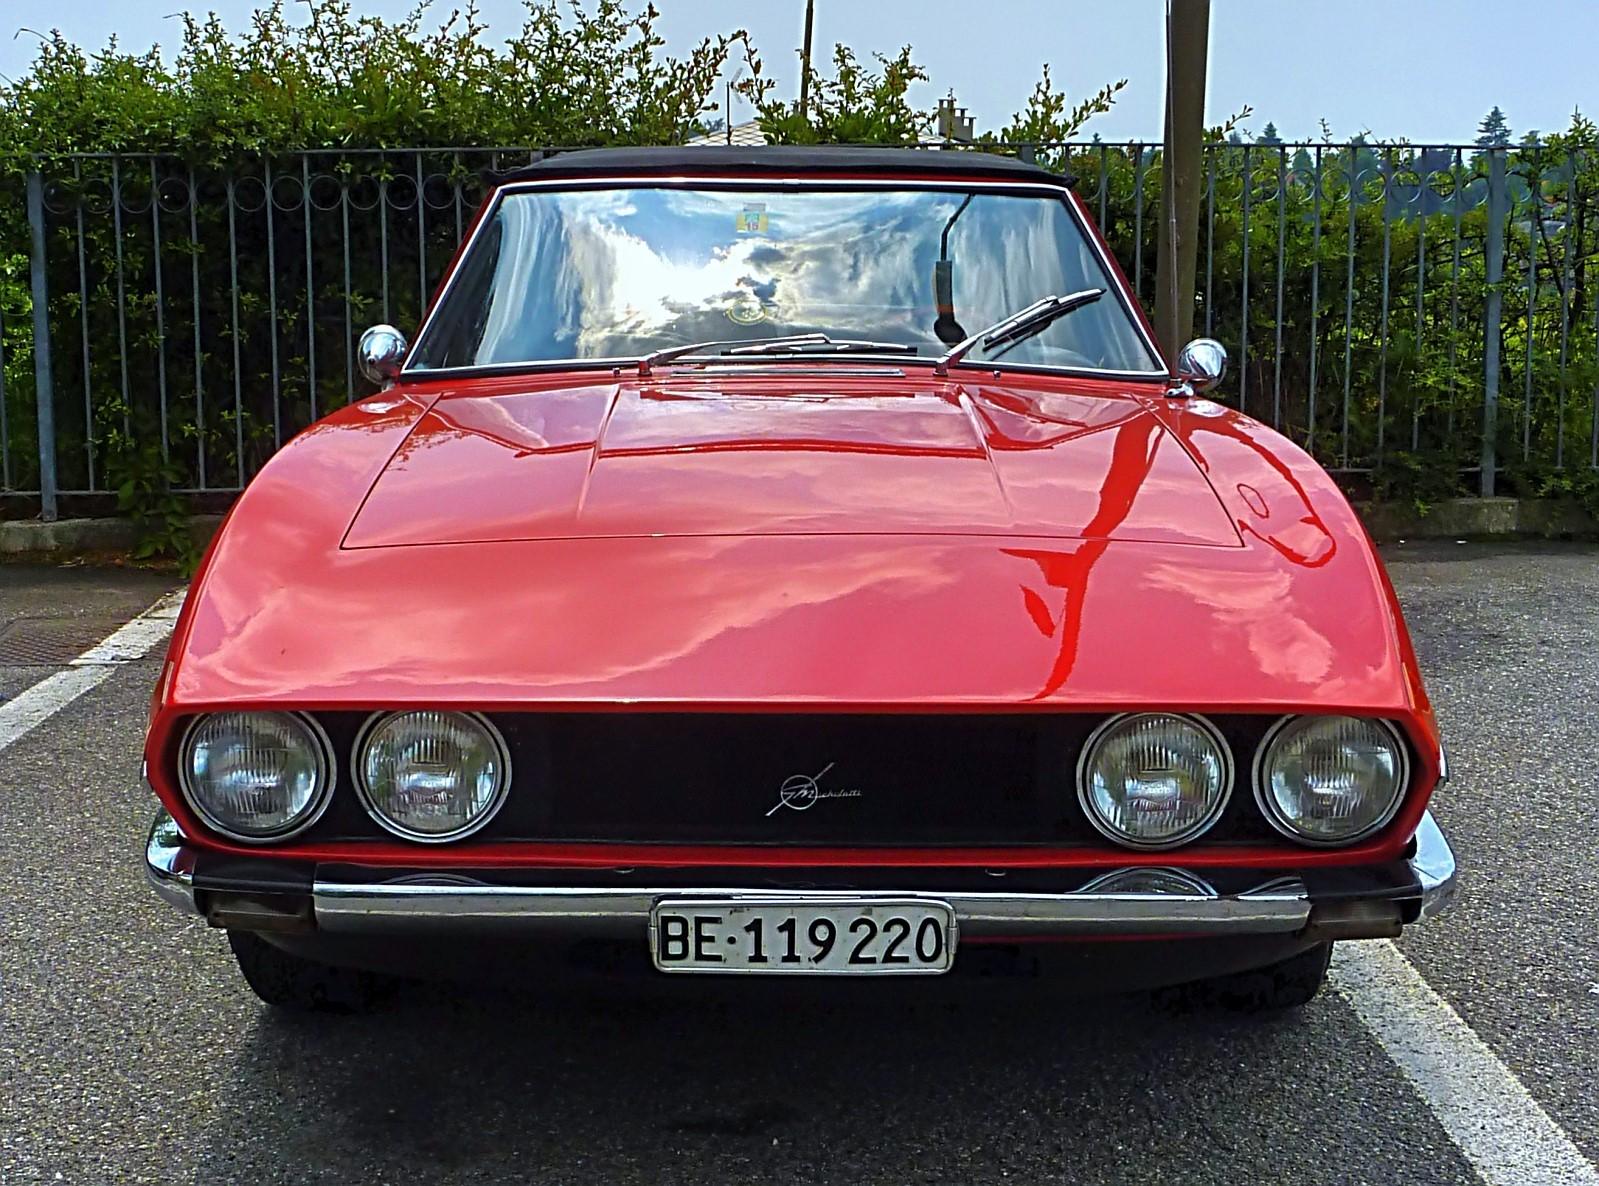 1968 Michelotti TR5 Ginevra Prototype (11)